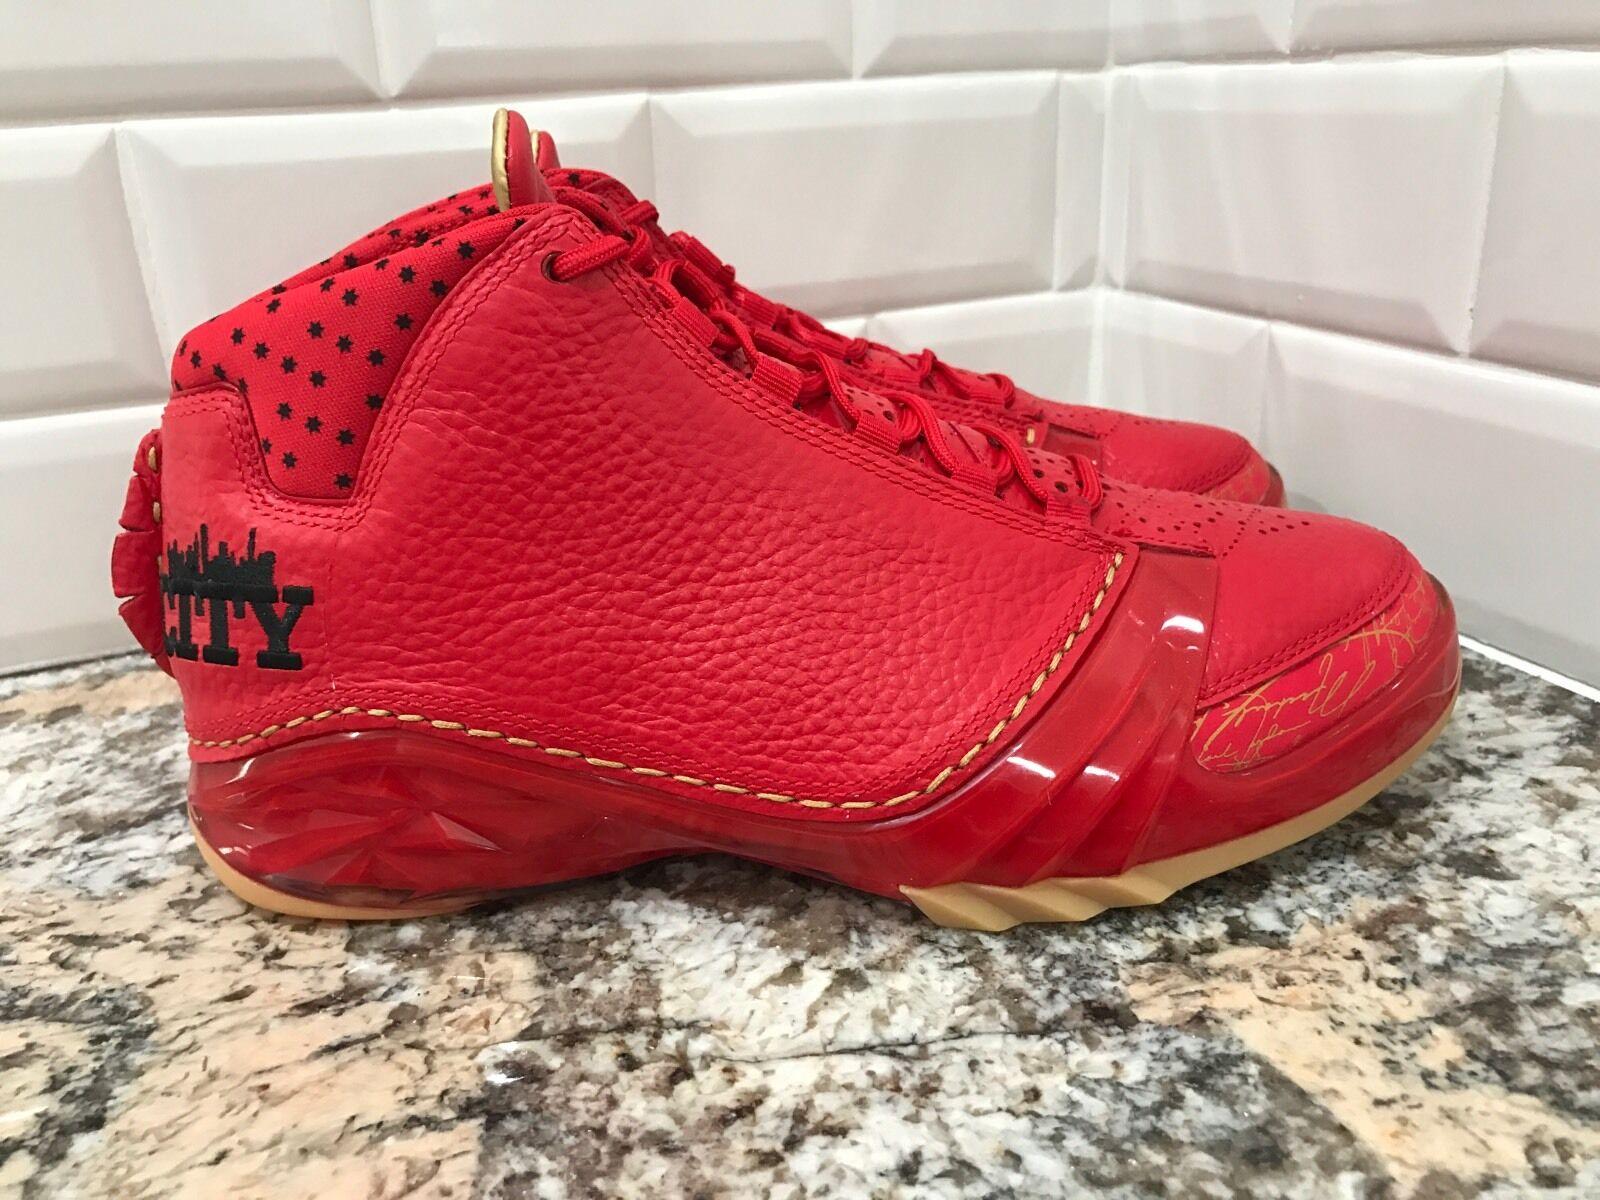 Nike Air Jordan XX3 23 Retro Chicago Price reduction Seasonal price cuts, discount benefits